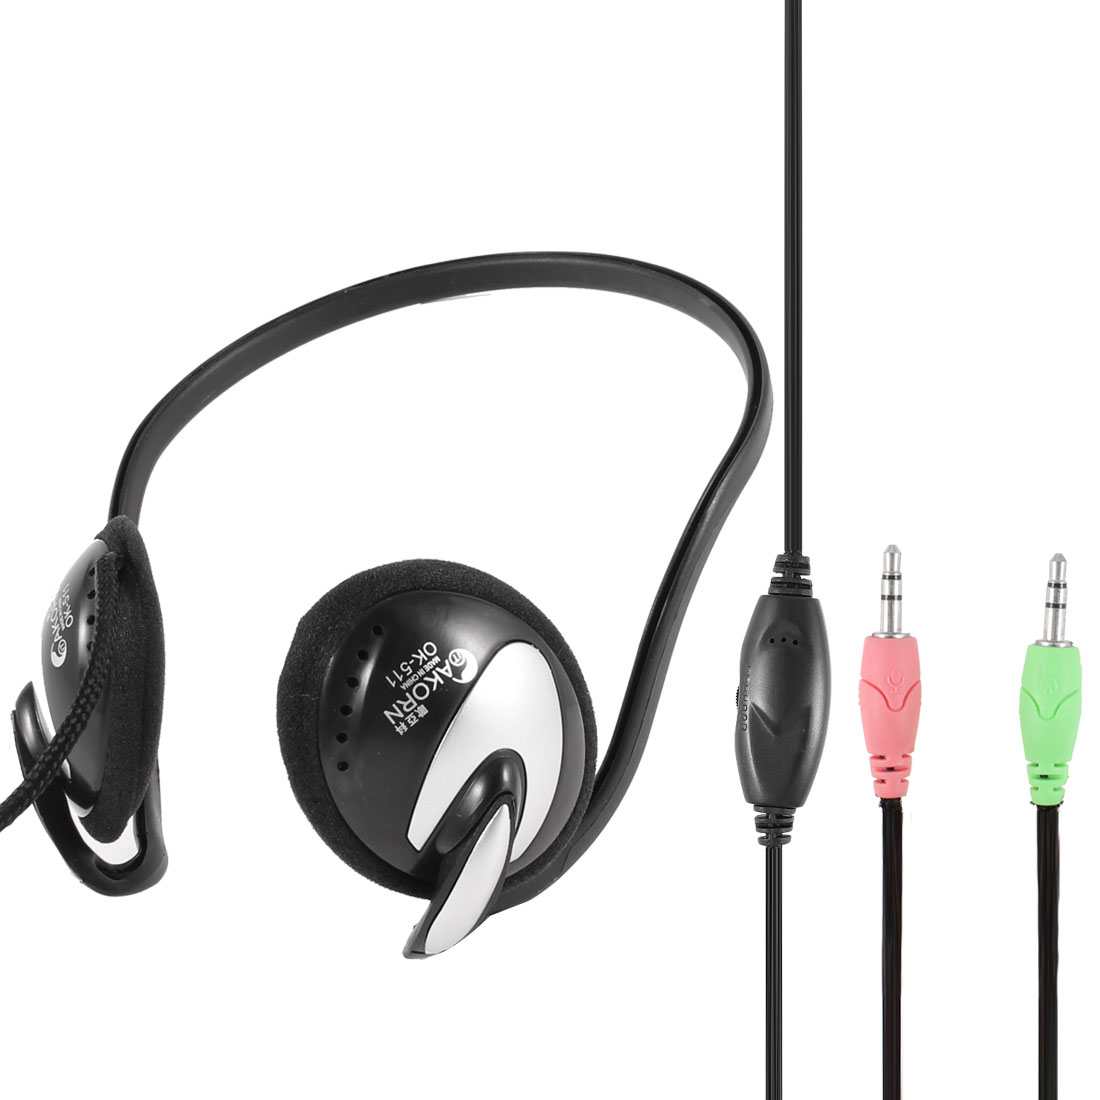 Slim Headband Laptop Desktop Headphone Headset 3.5mm Connector w Microphone